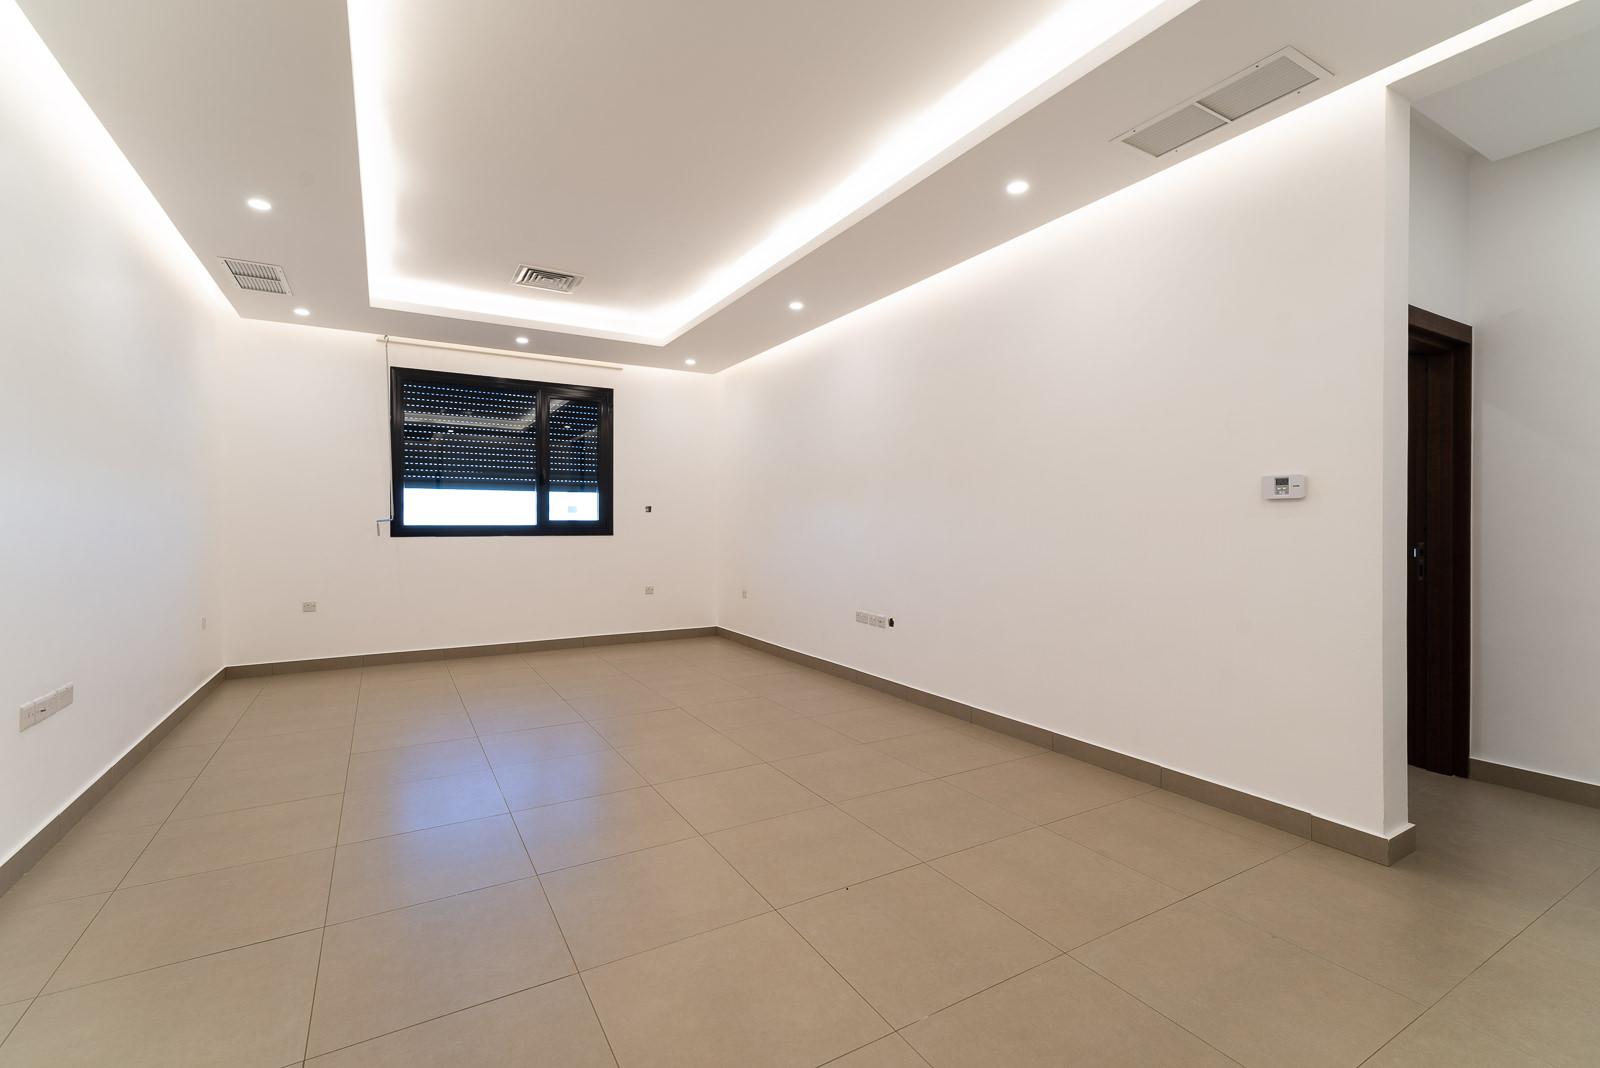 Bayan – large, new, ufnurnished three bedroom apartments